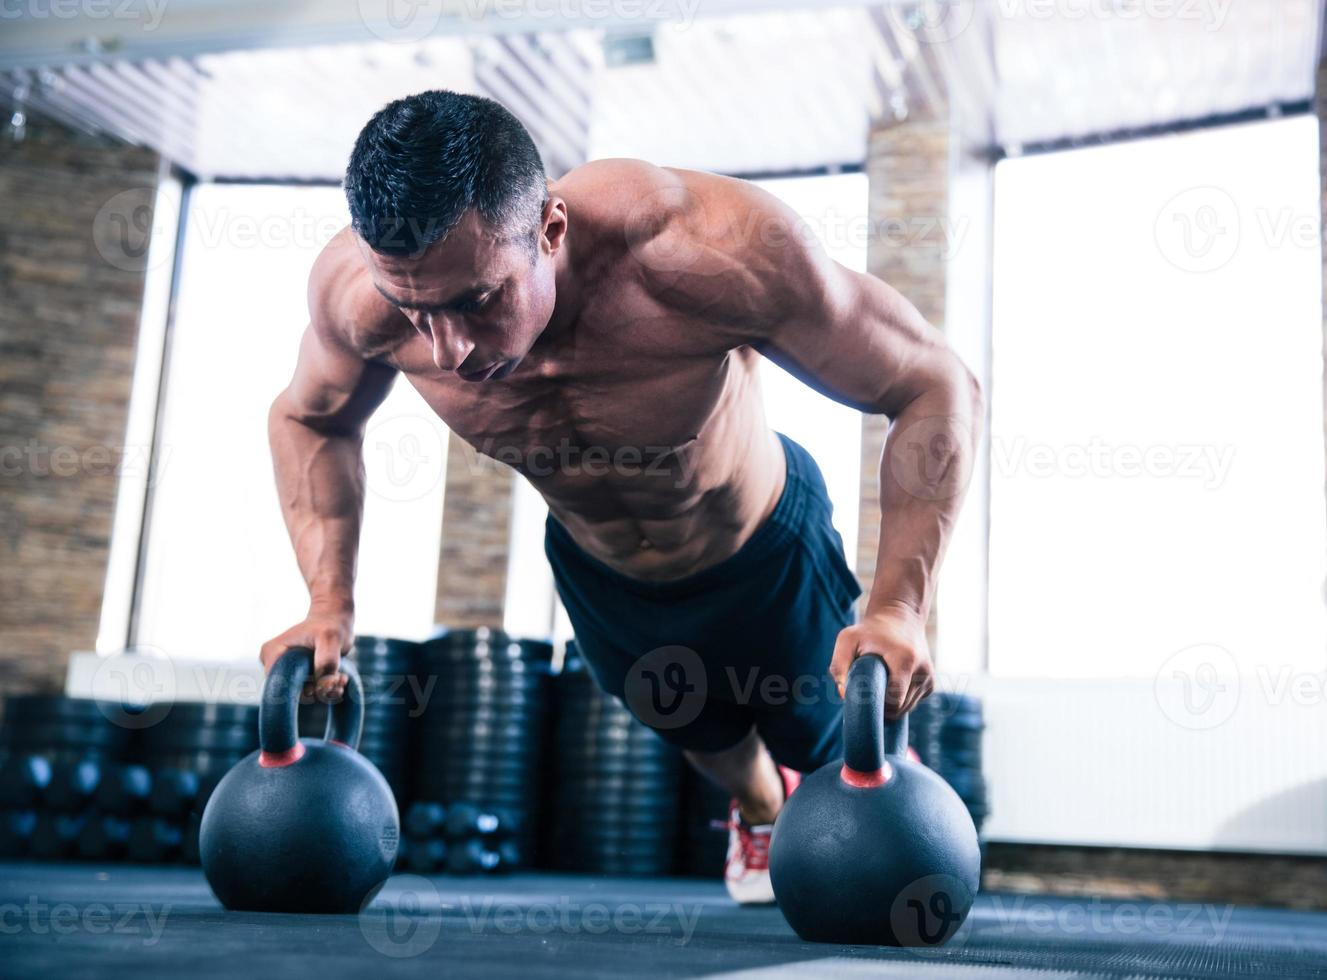 gespierde man doet push-ups in de sportschool foto